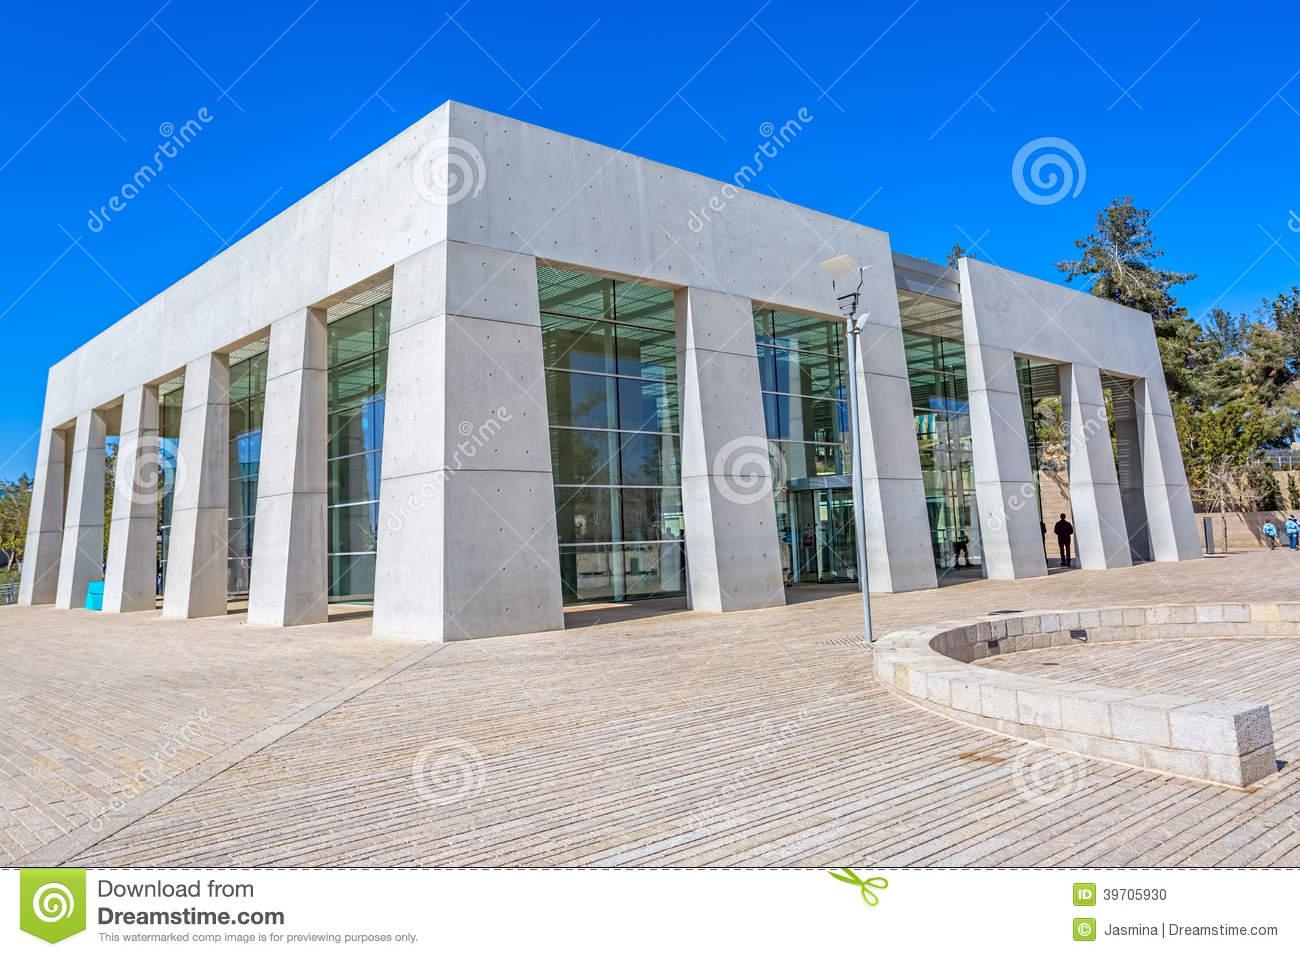 yad-vashem-jerusalem-tel-aviv-israel-february-main-entrance-to-israel-s-official-memorial-to-jewish-victims-39705930[1]